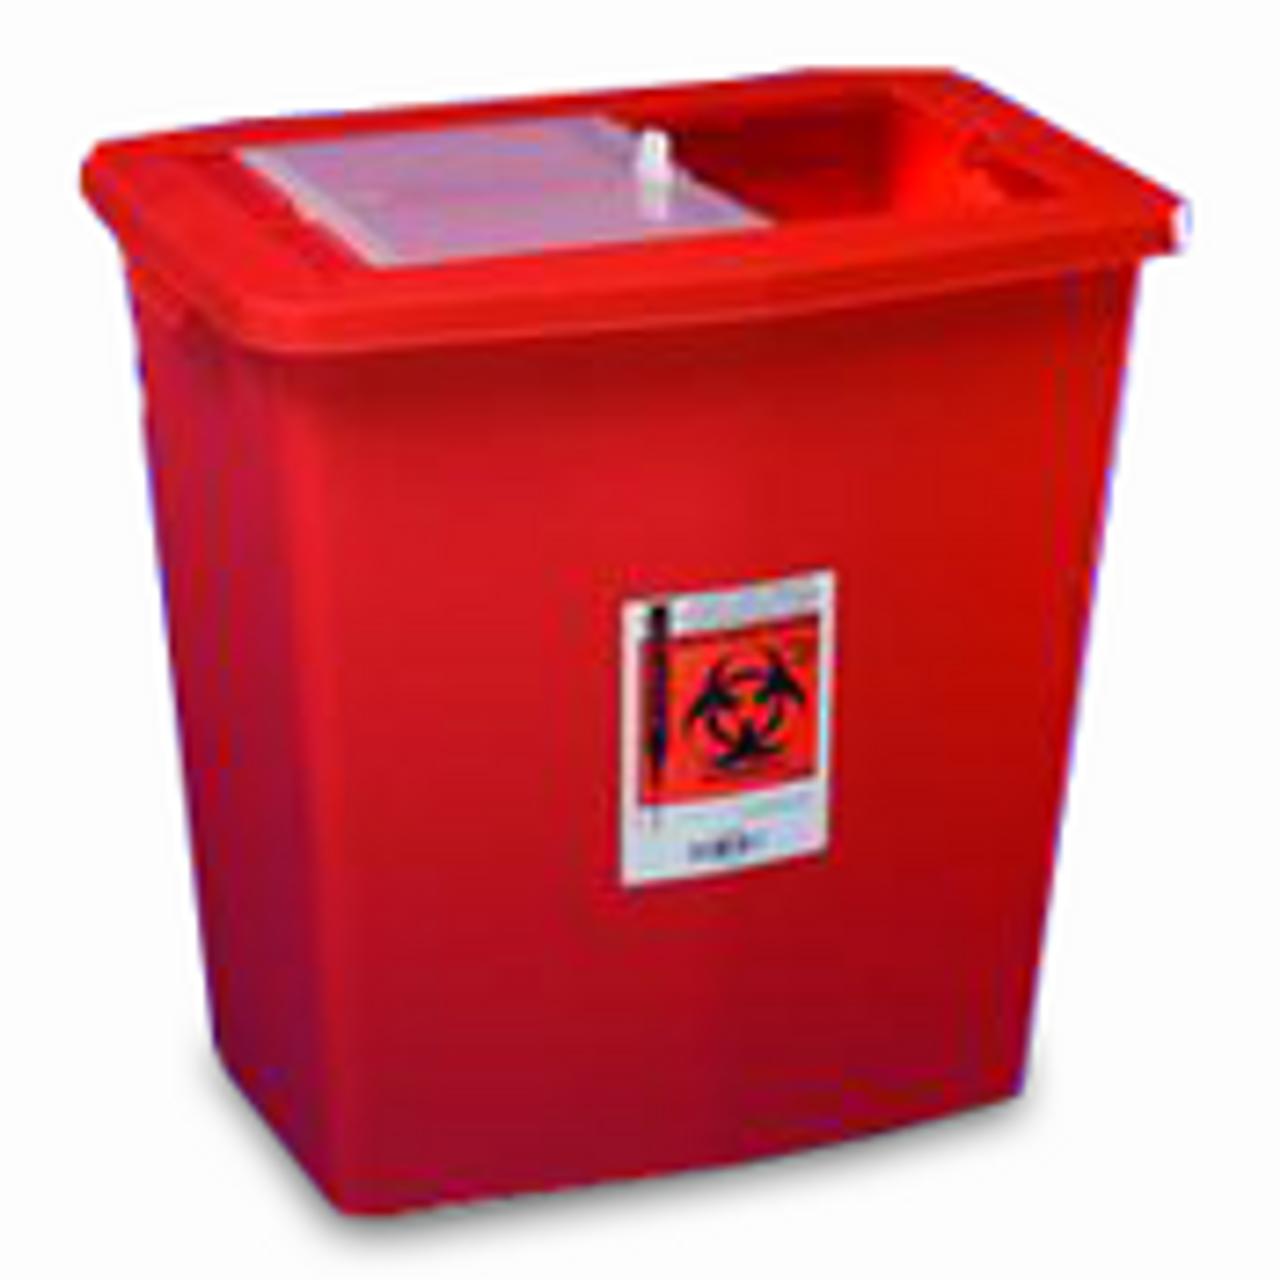 Biohazard Disposal